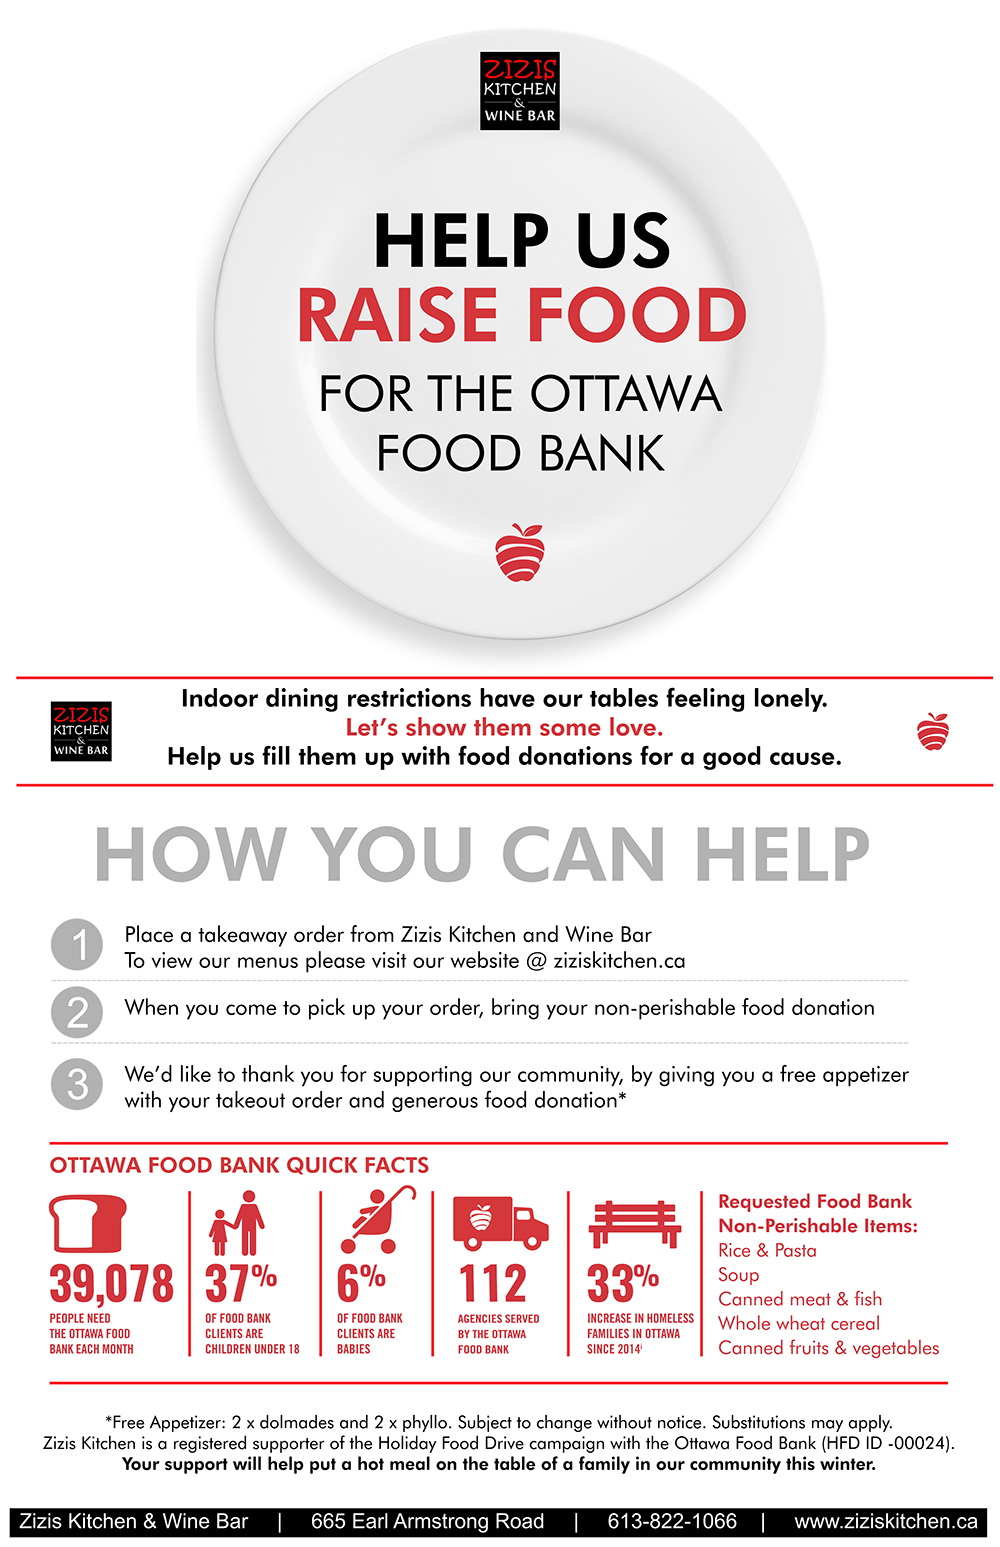 Zizis Kitchen Ottawa Food Bank Fundraiser